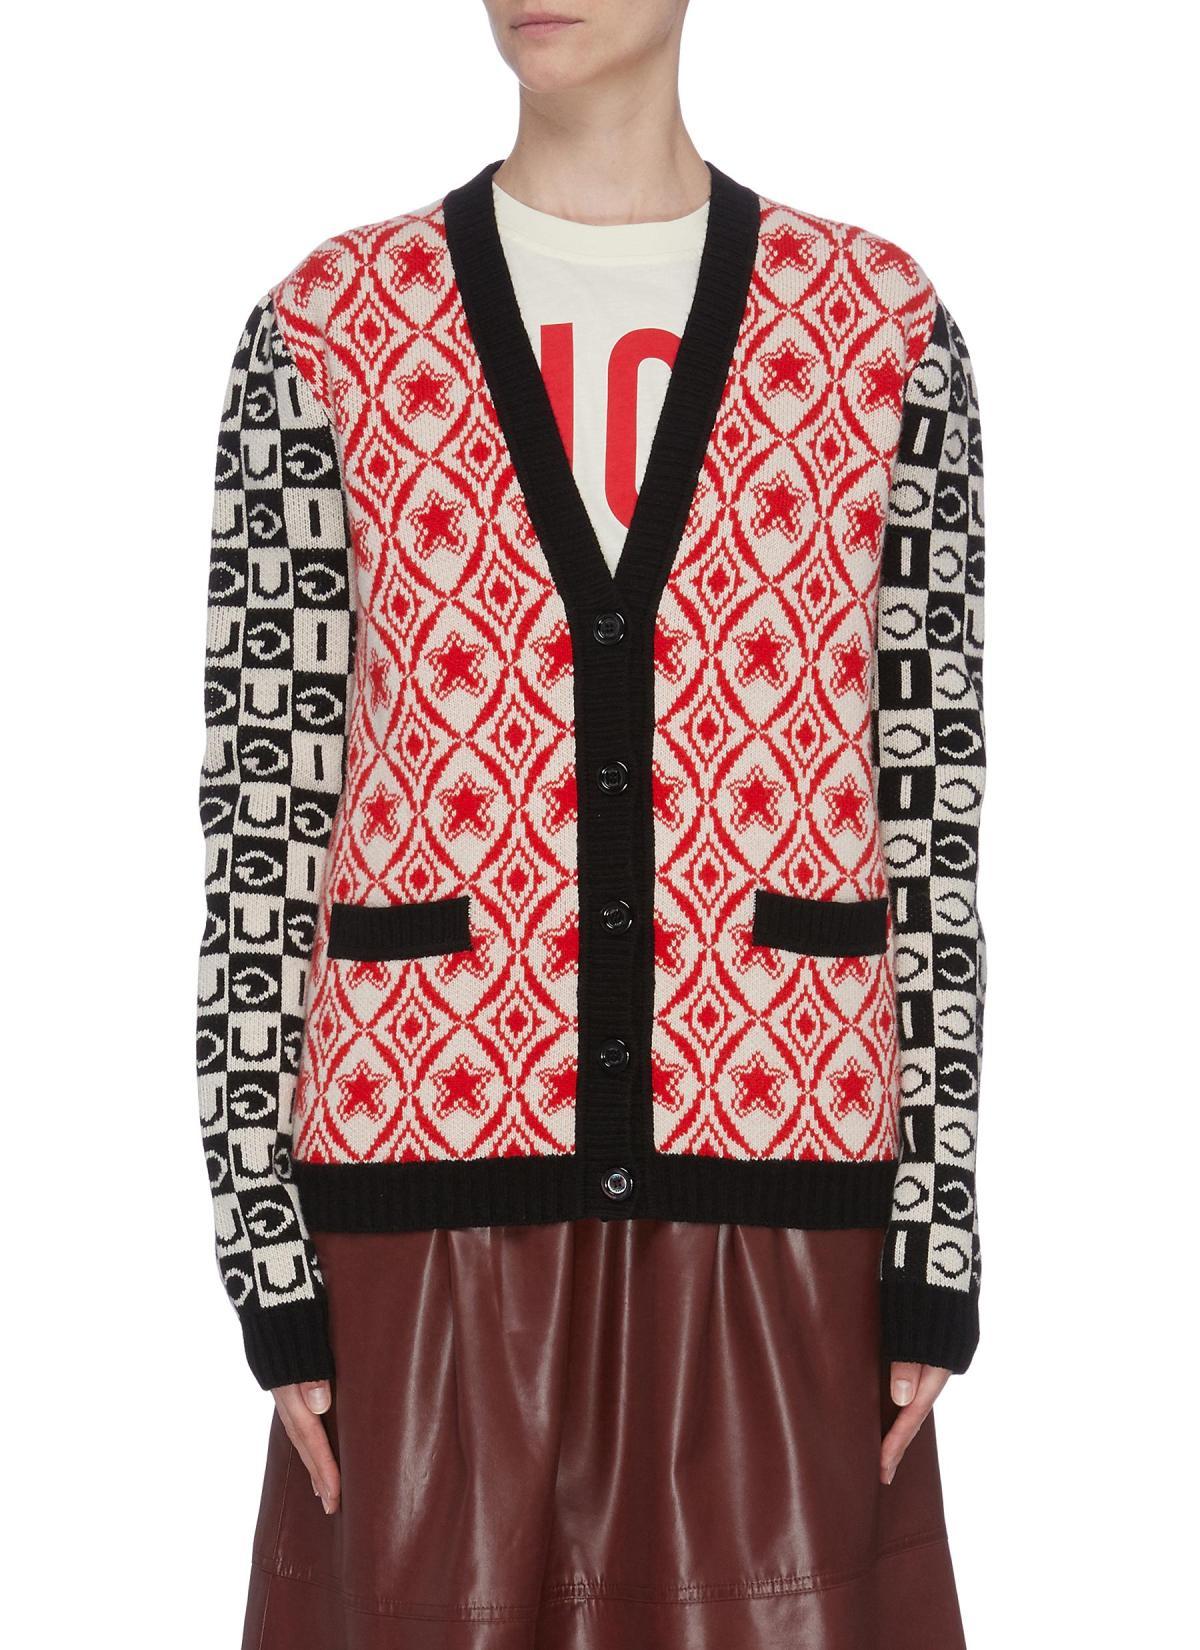 Gucci Mixed Jacquard Cardigan HKD$13,200